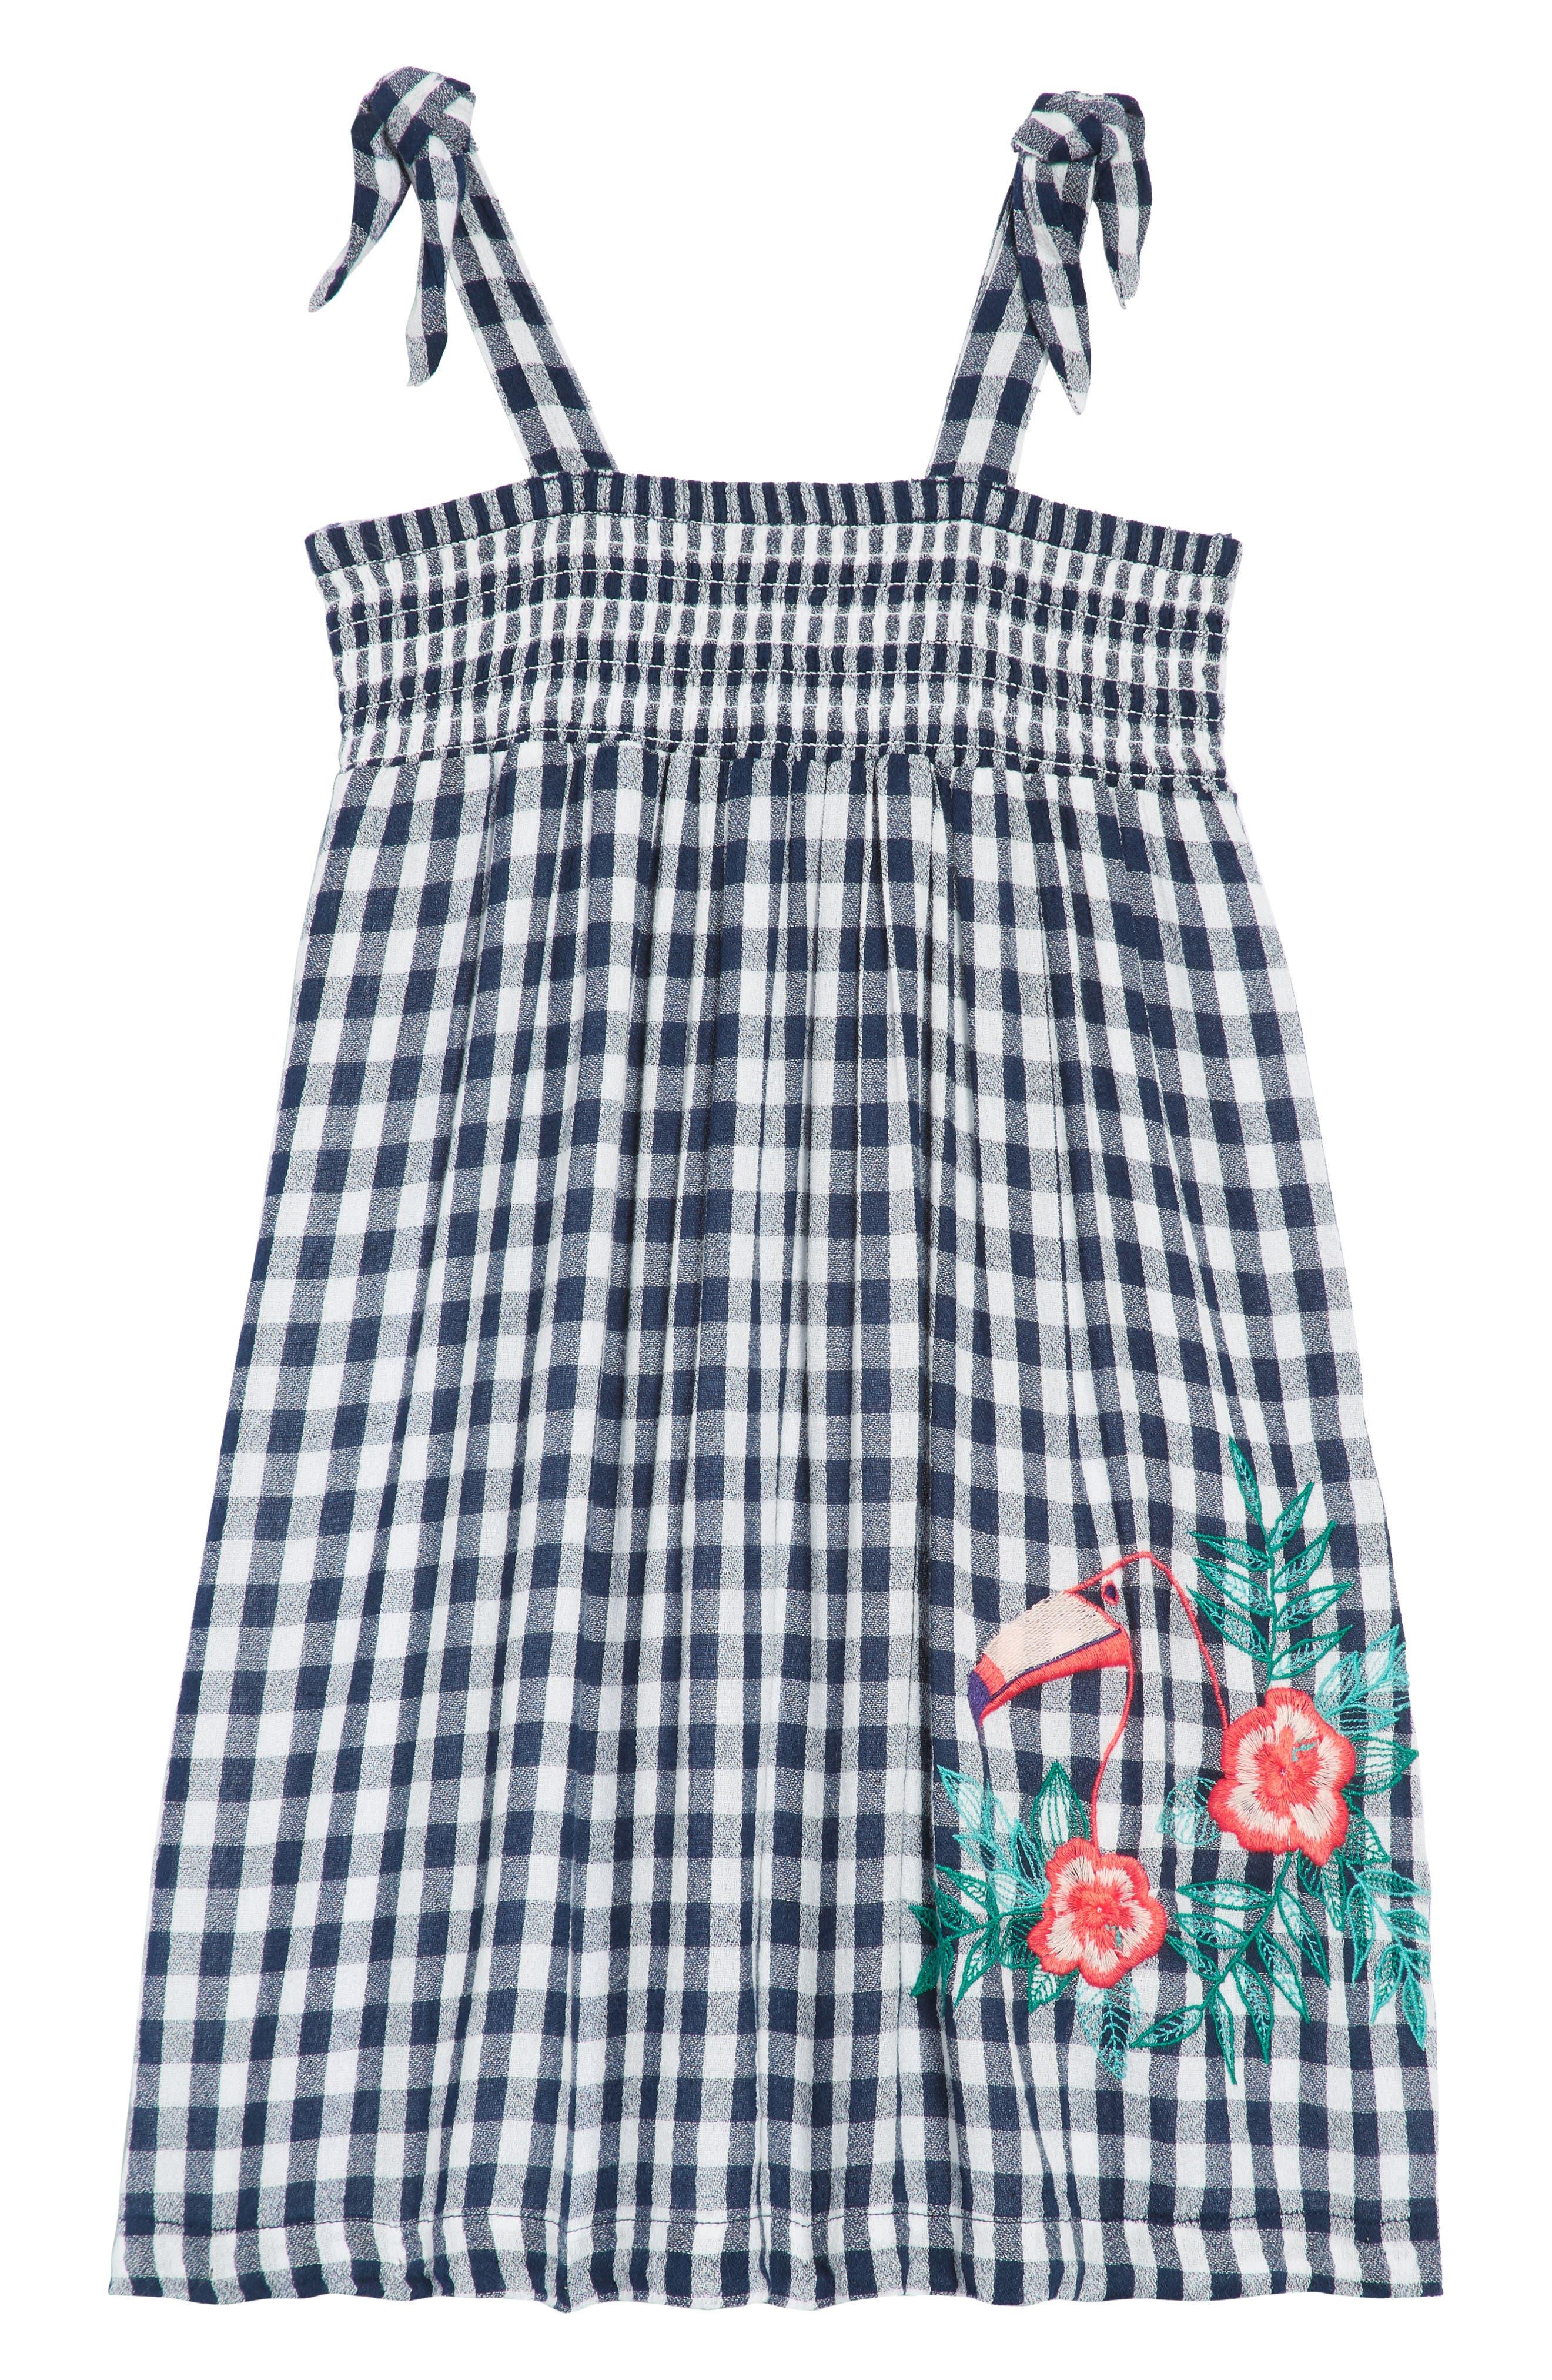 TUCKER + TATE,                             Smocked Gingham Dress,                             Main thumbnail 1, color,                             410